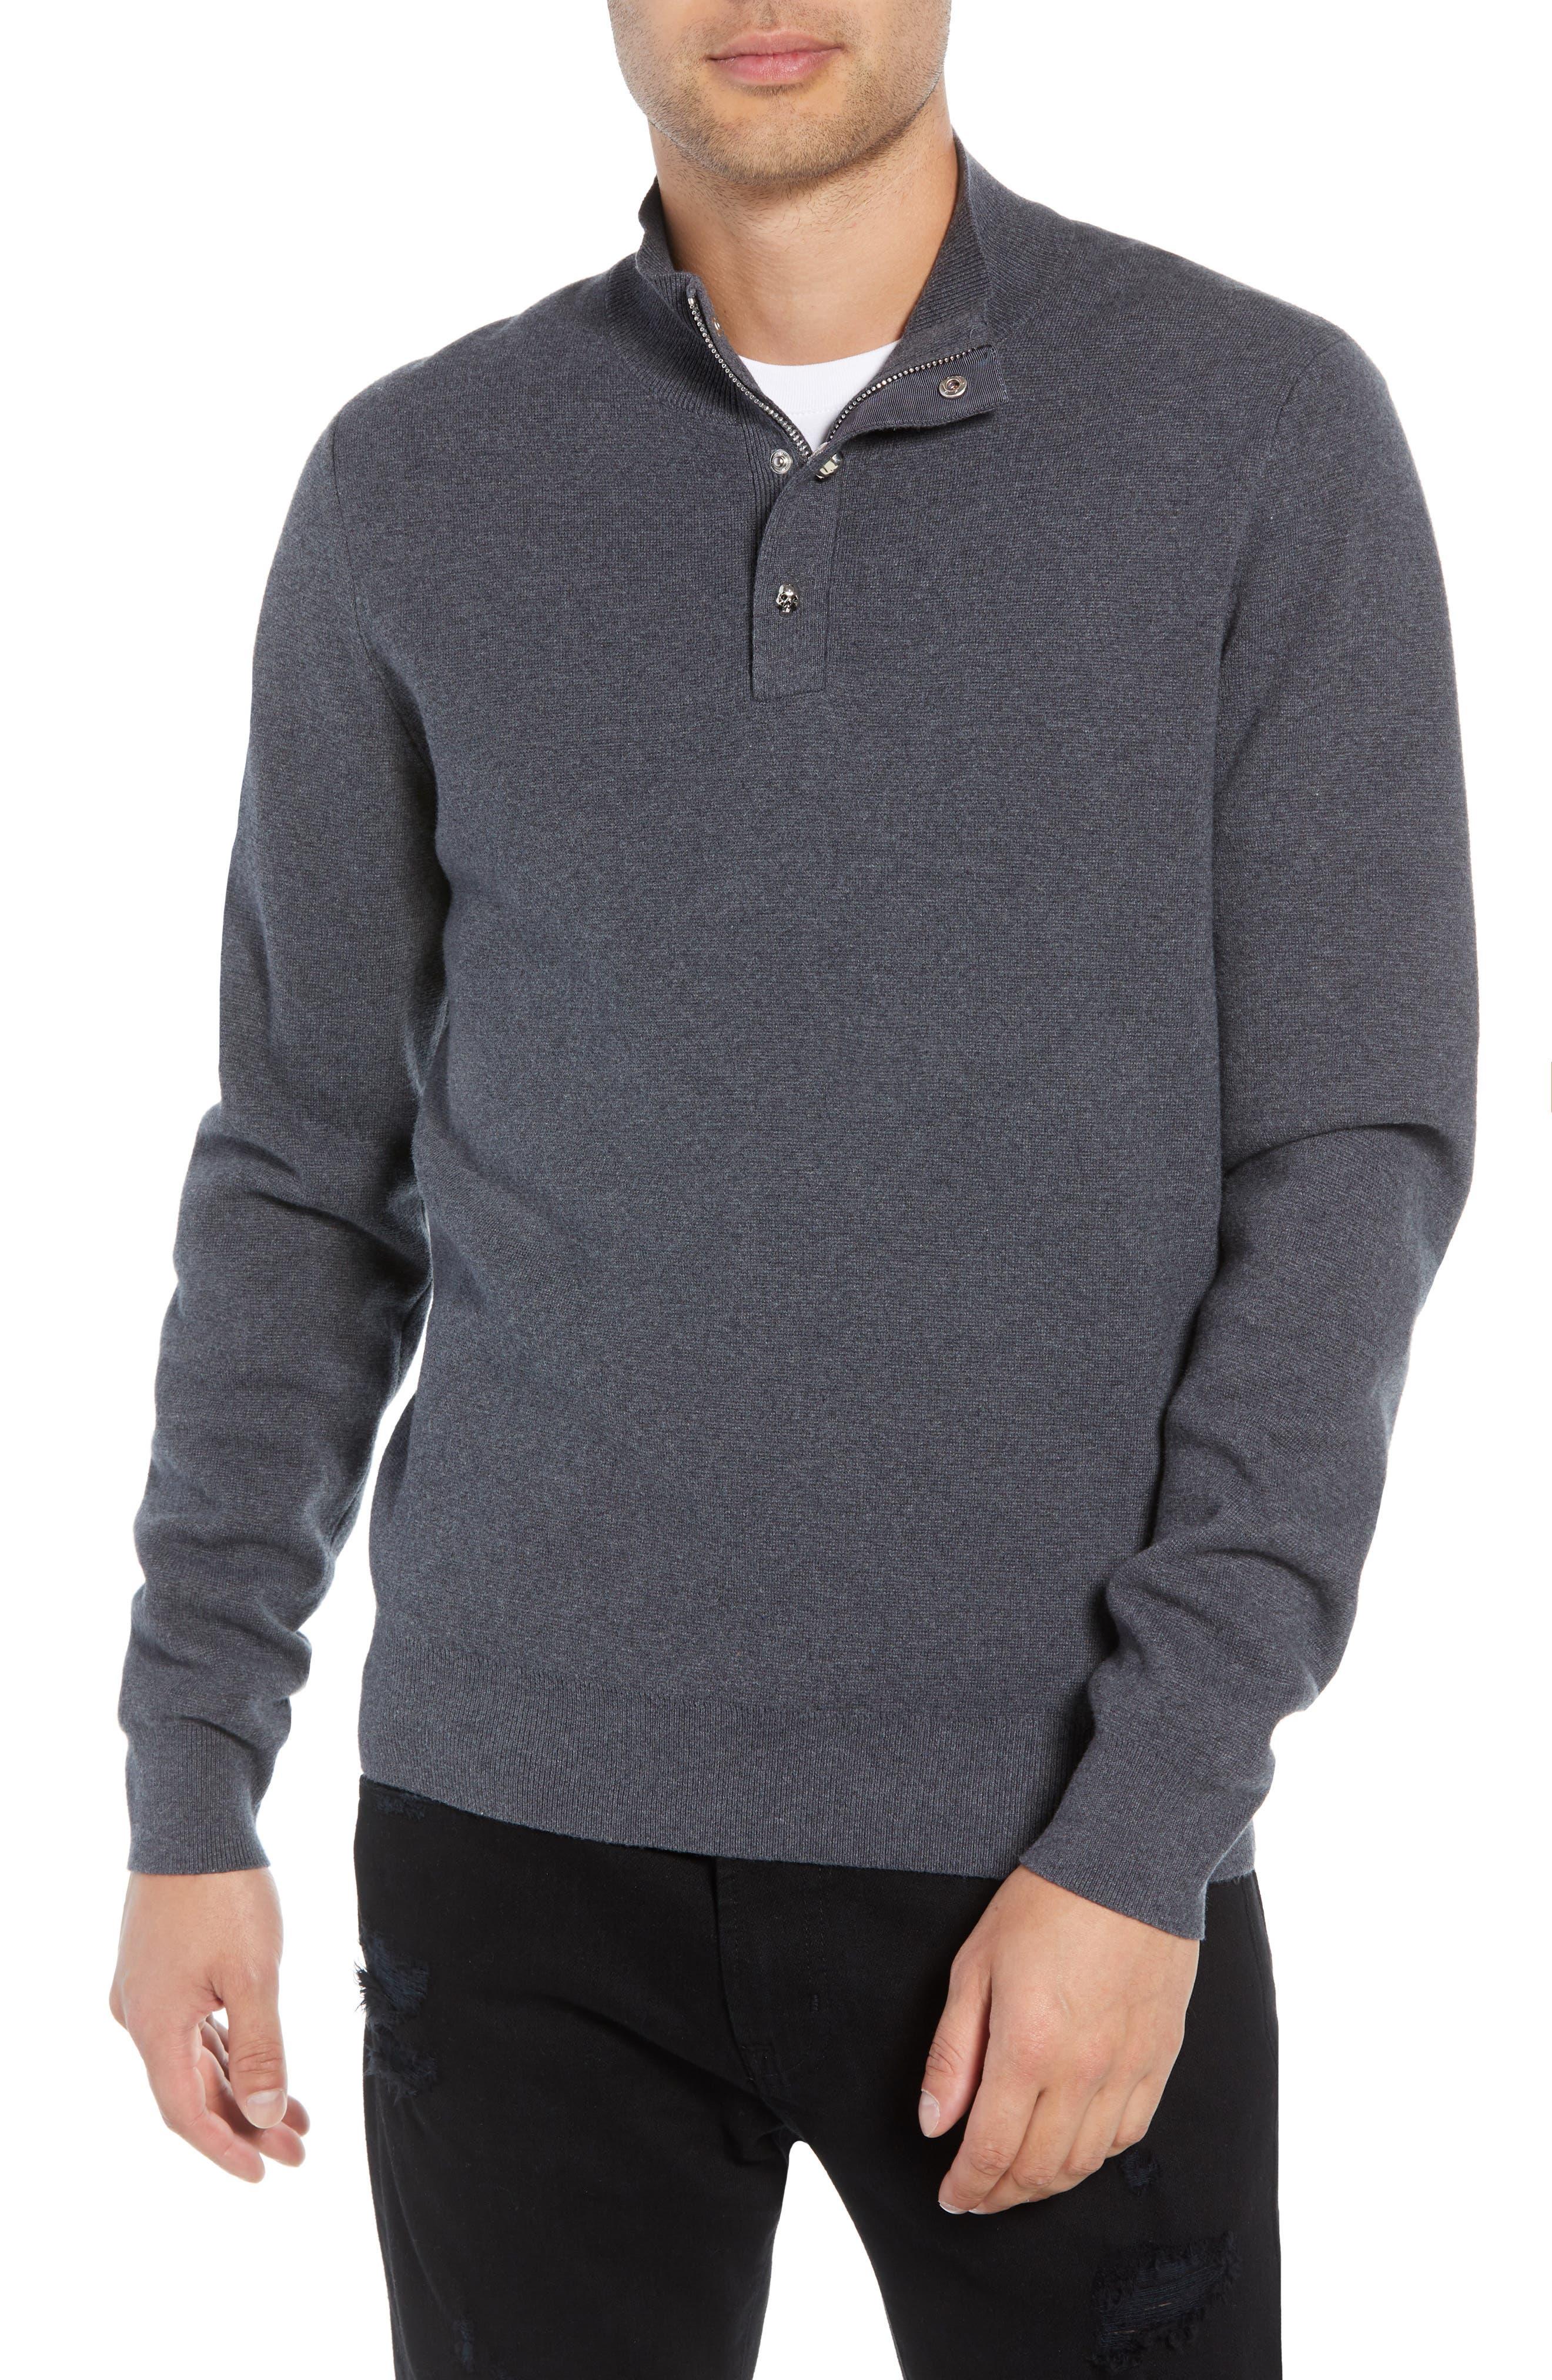 Classic Fit Skullhead Sweater,                             Main thumbnail 1, color,                             GREY